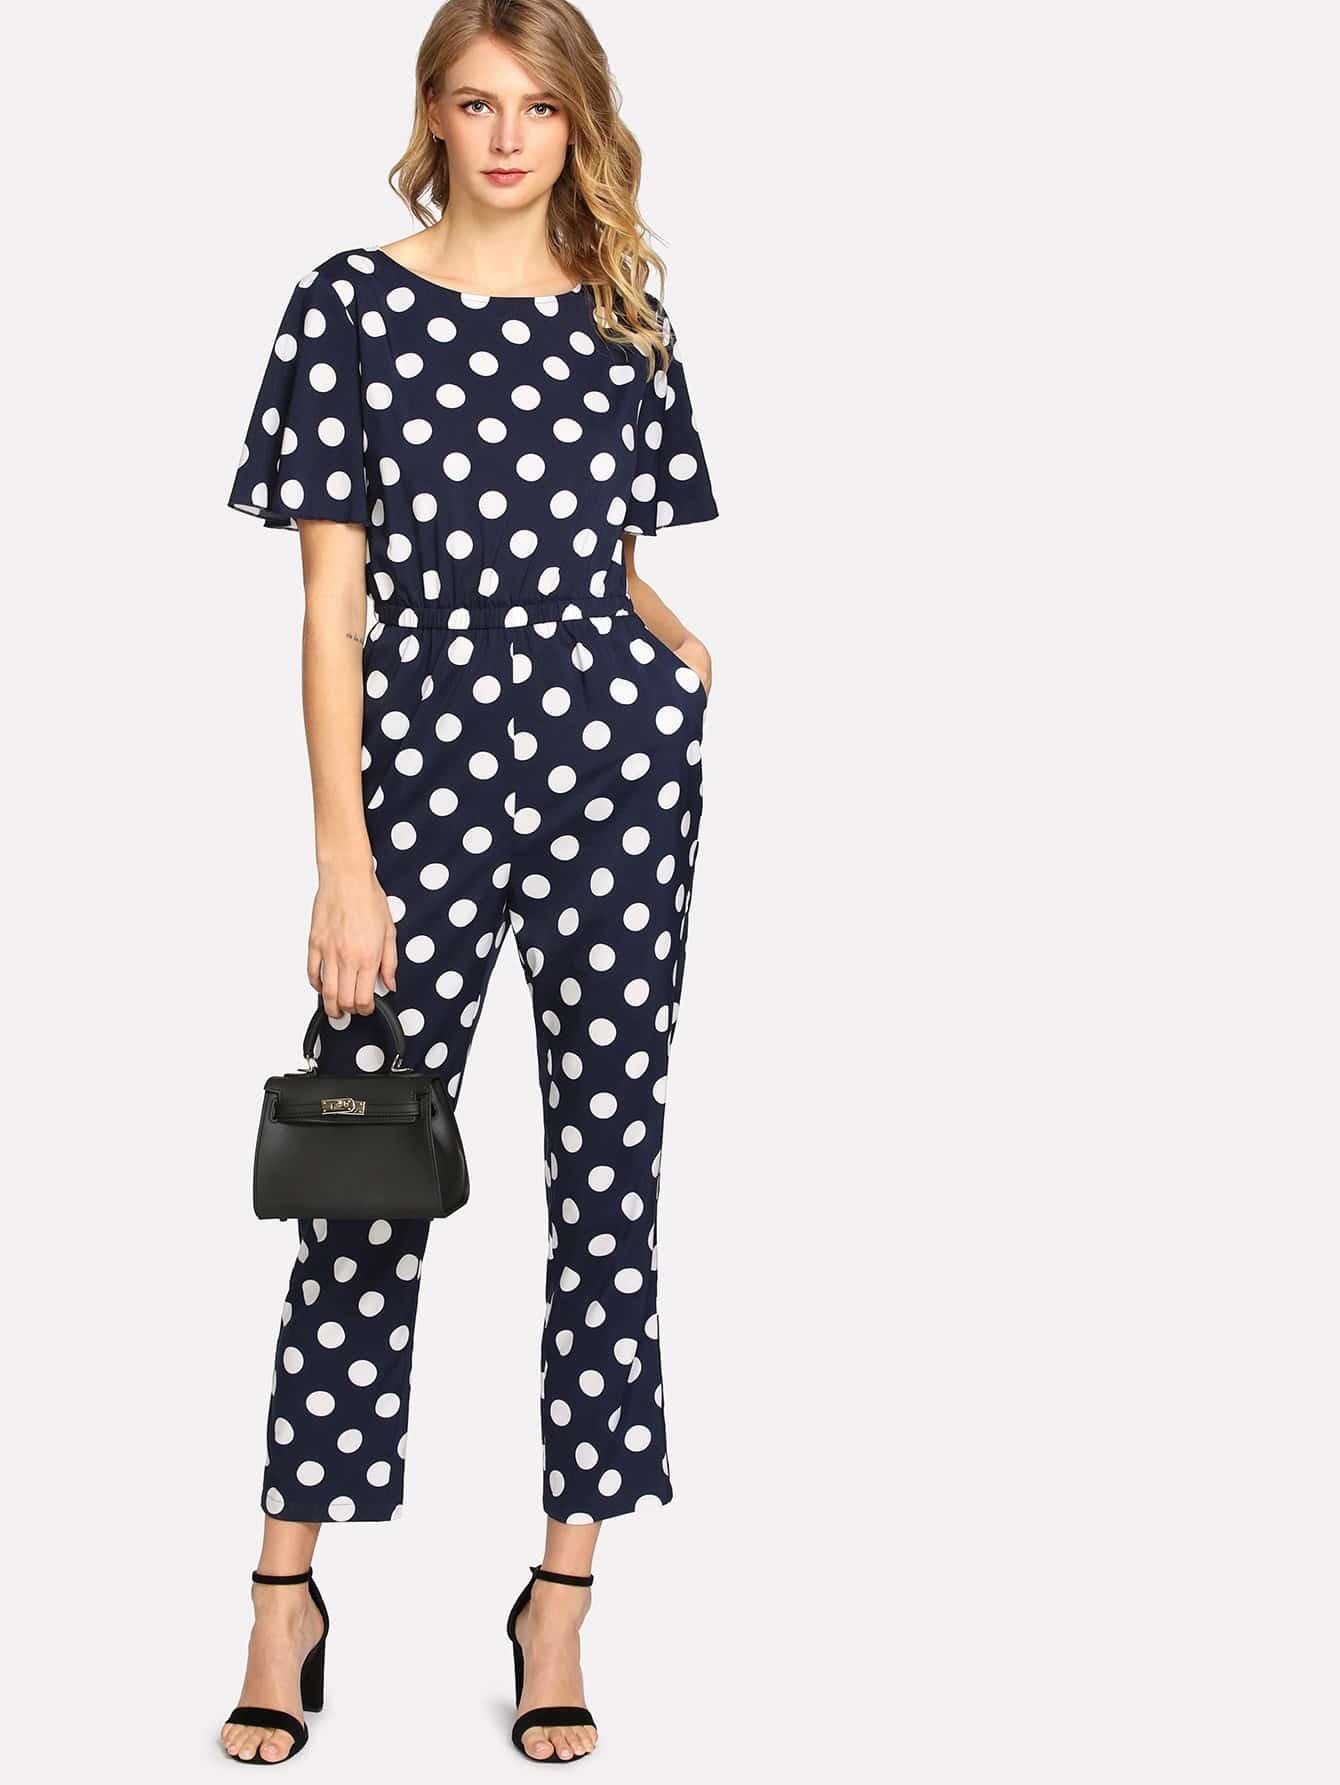 Image of Allover Polka Dot Elastic Waist Jumpsuit